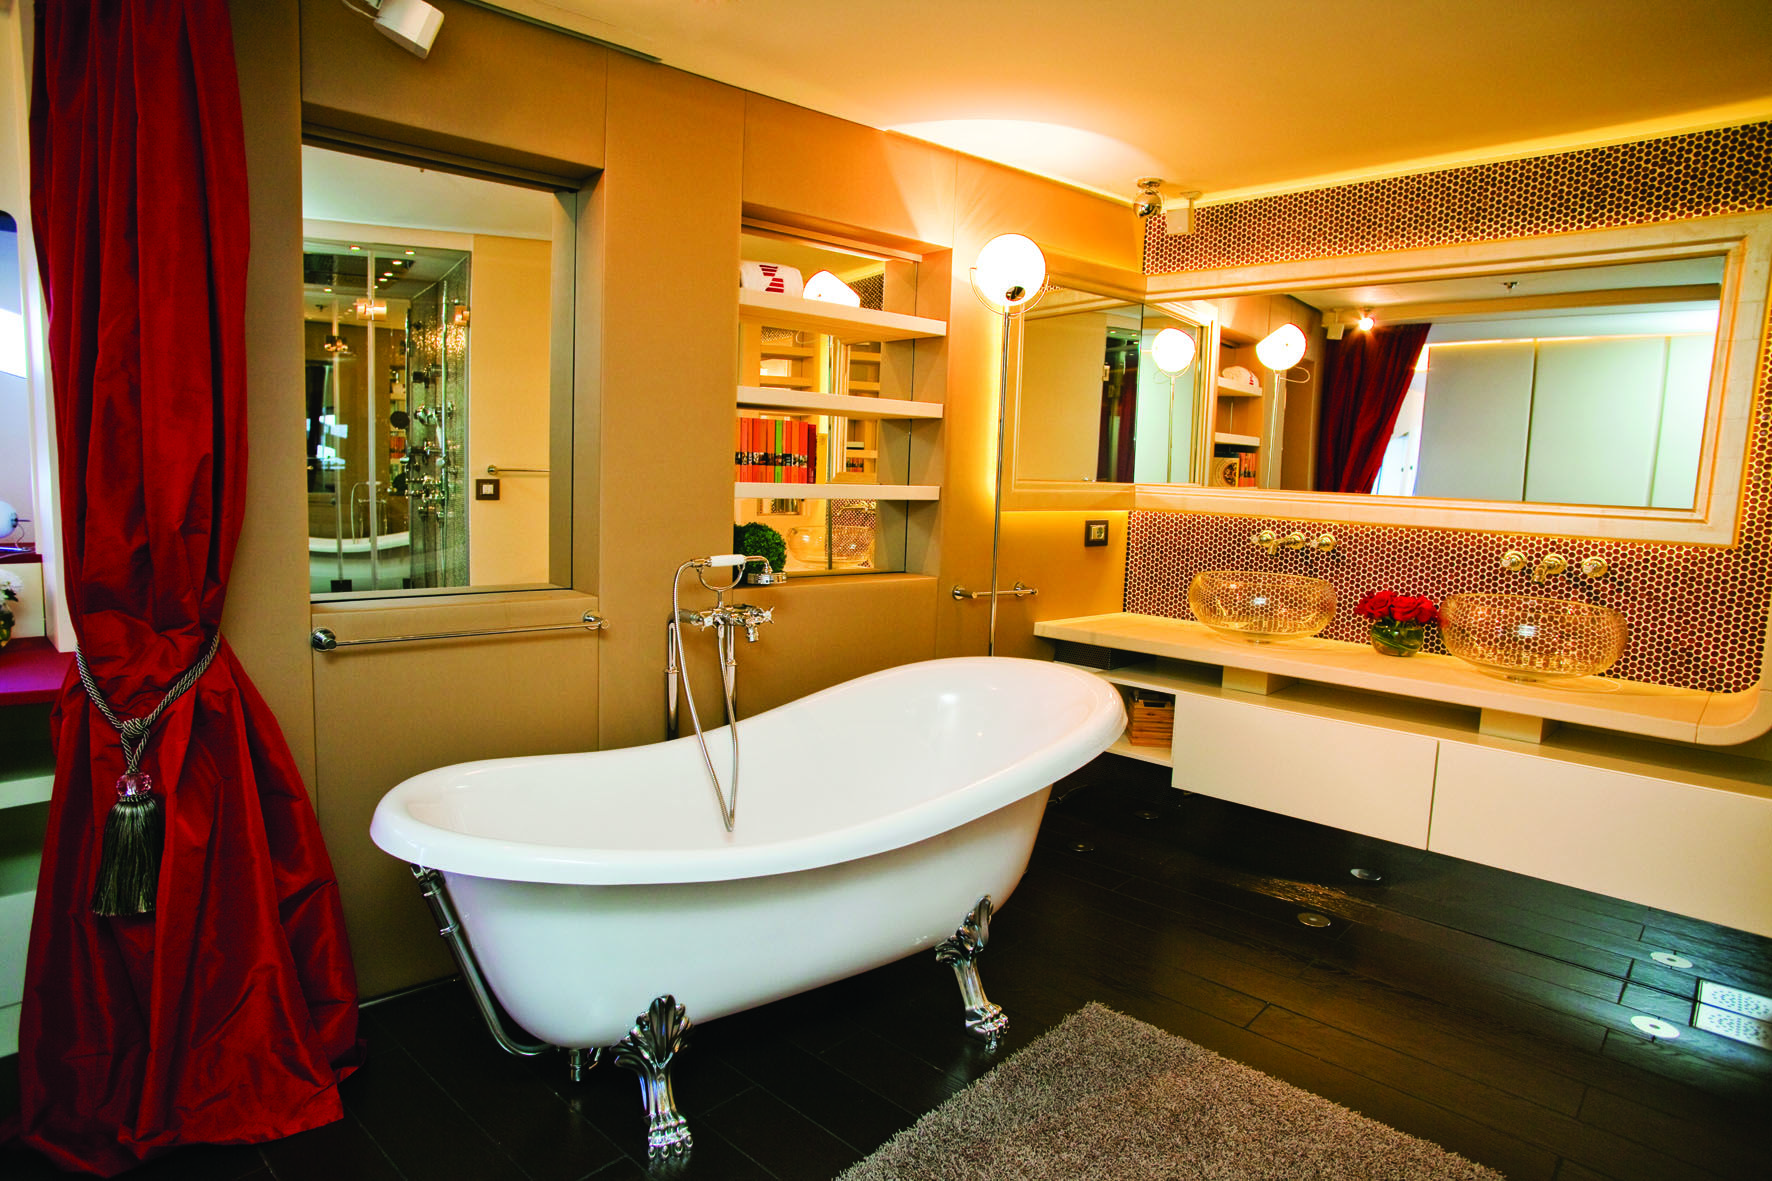 Awesome Vintage Bathtub bathtub Soaking Tubs Pinterest